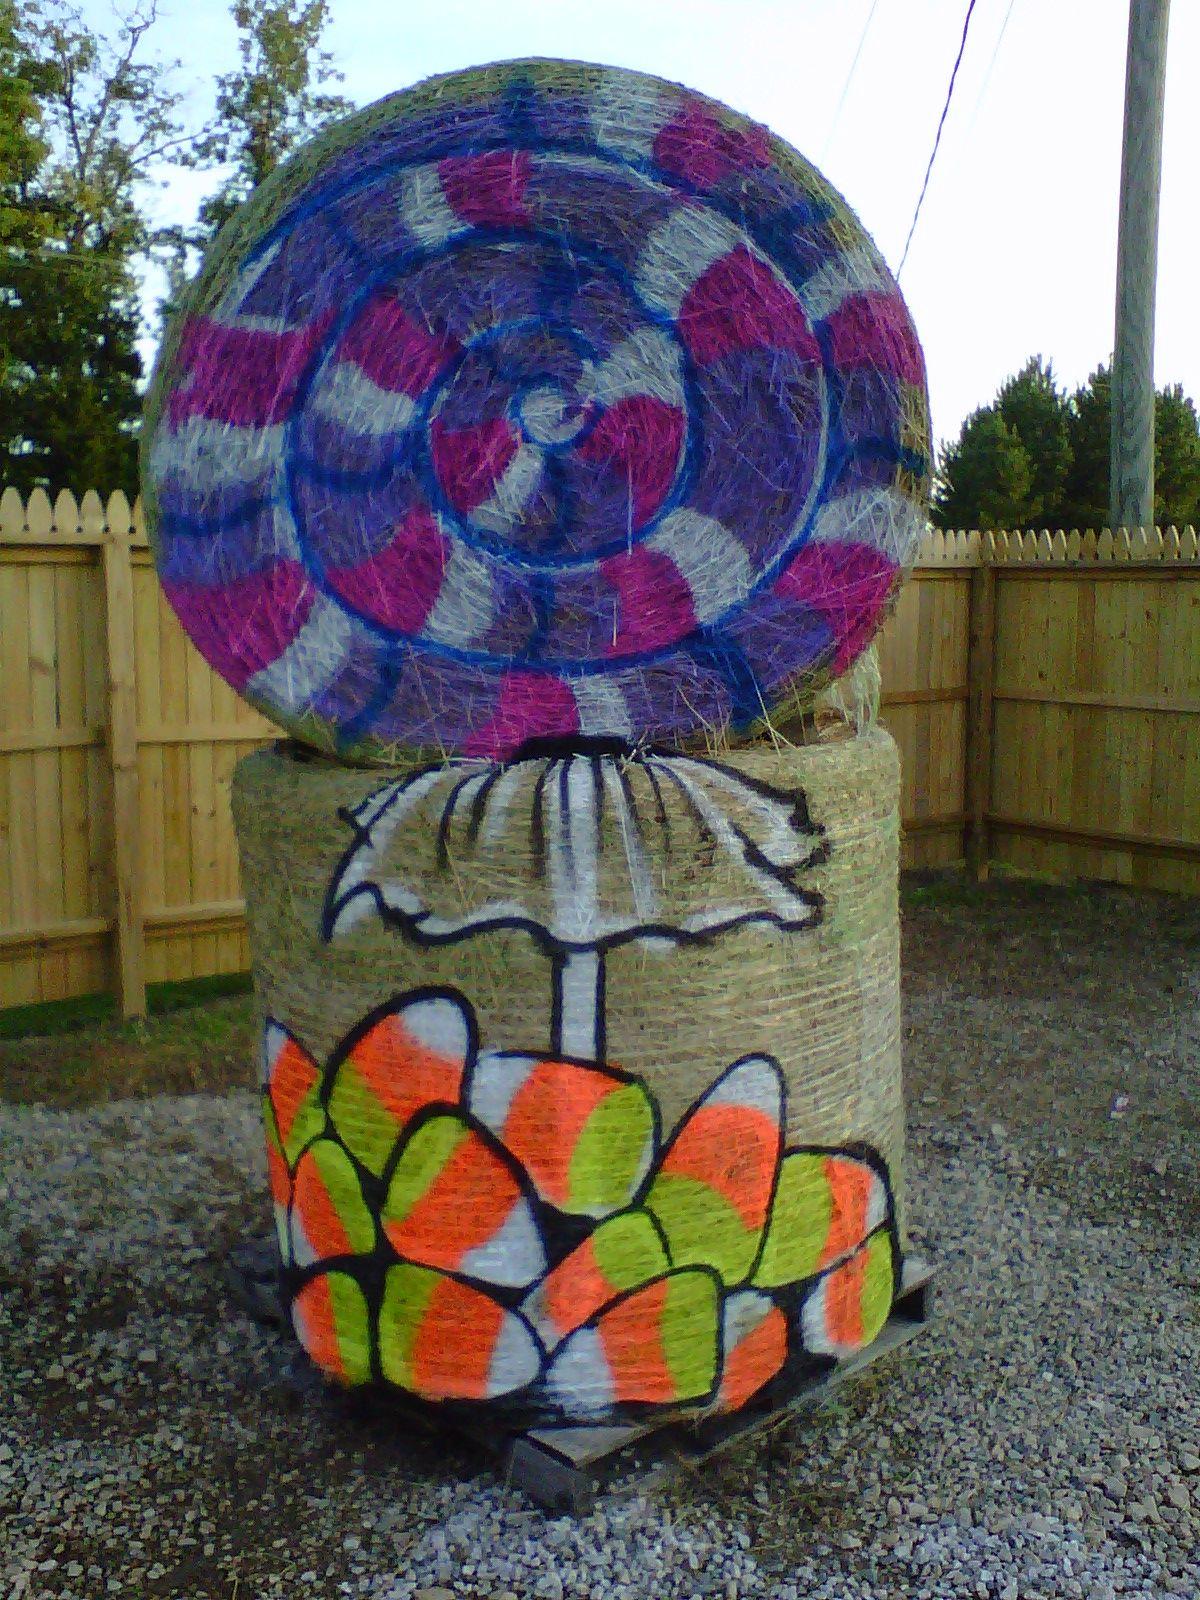 Painted Hay Bale at Hill Ridge Farms by Cyndi McKnight 2011